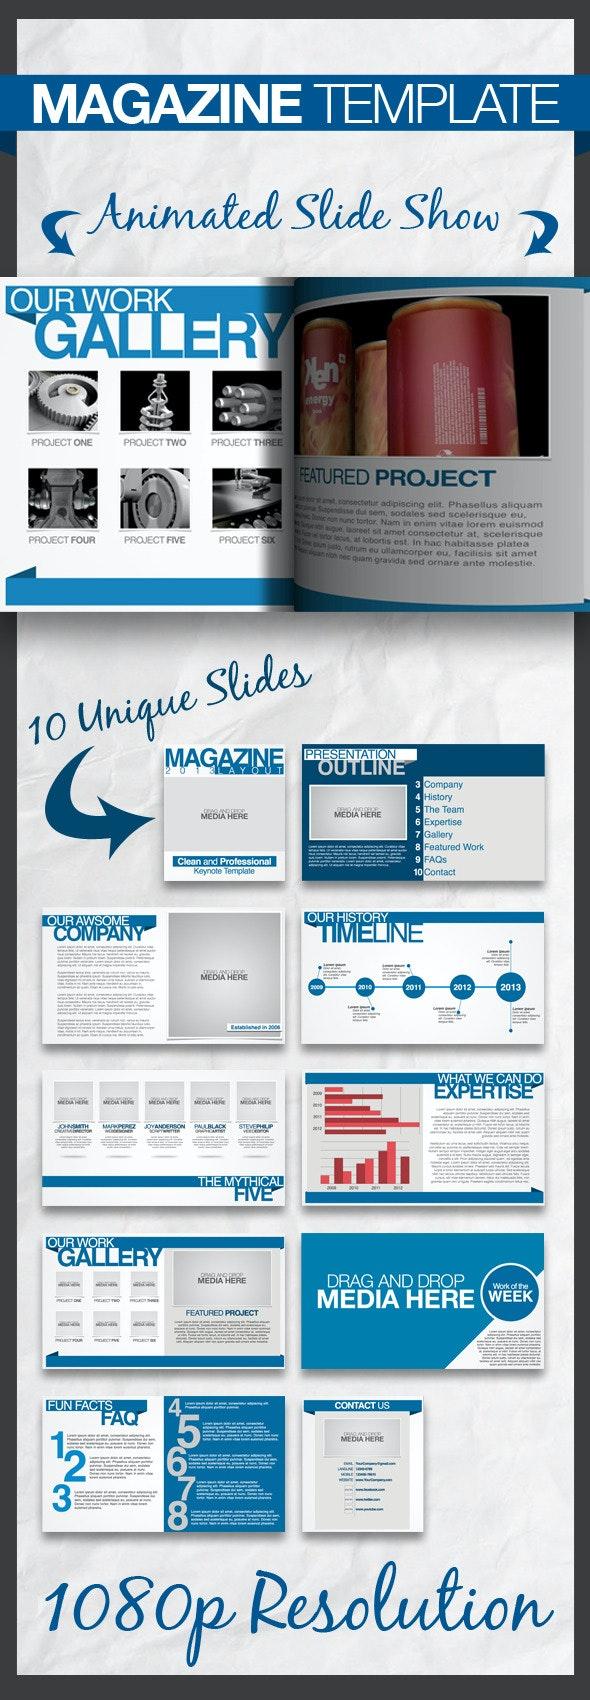 Magazine Keynote Presentation Template - Business Keynote Templates